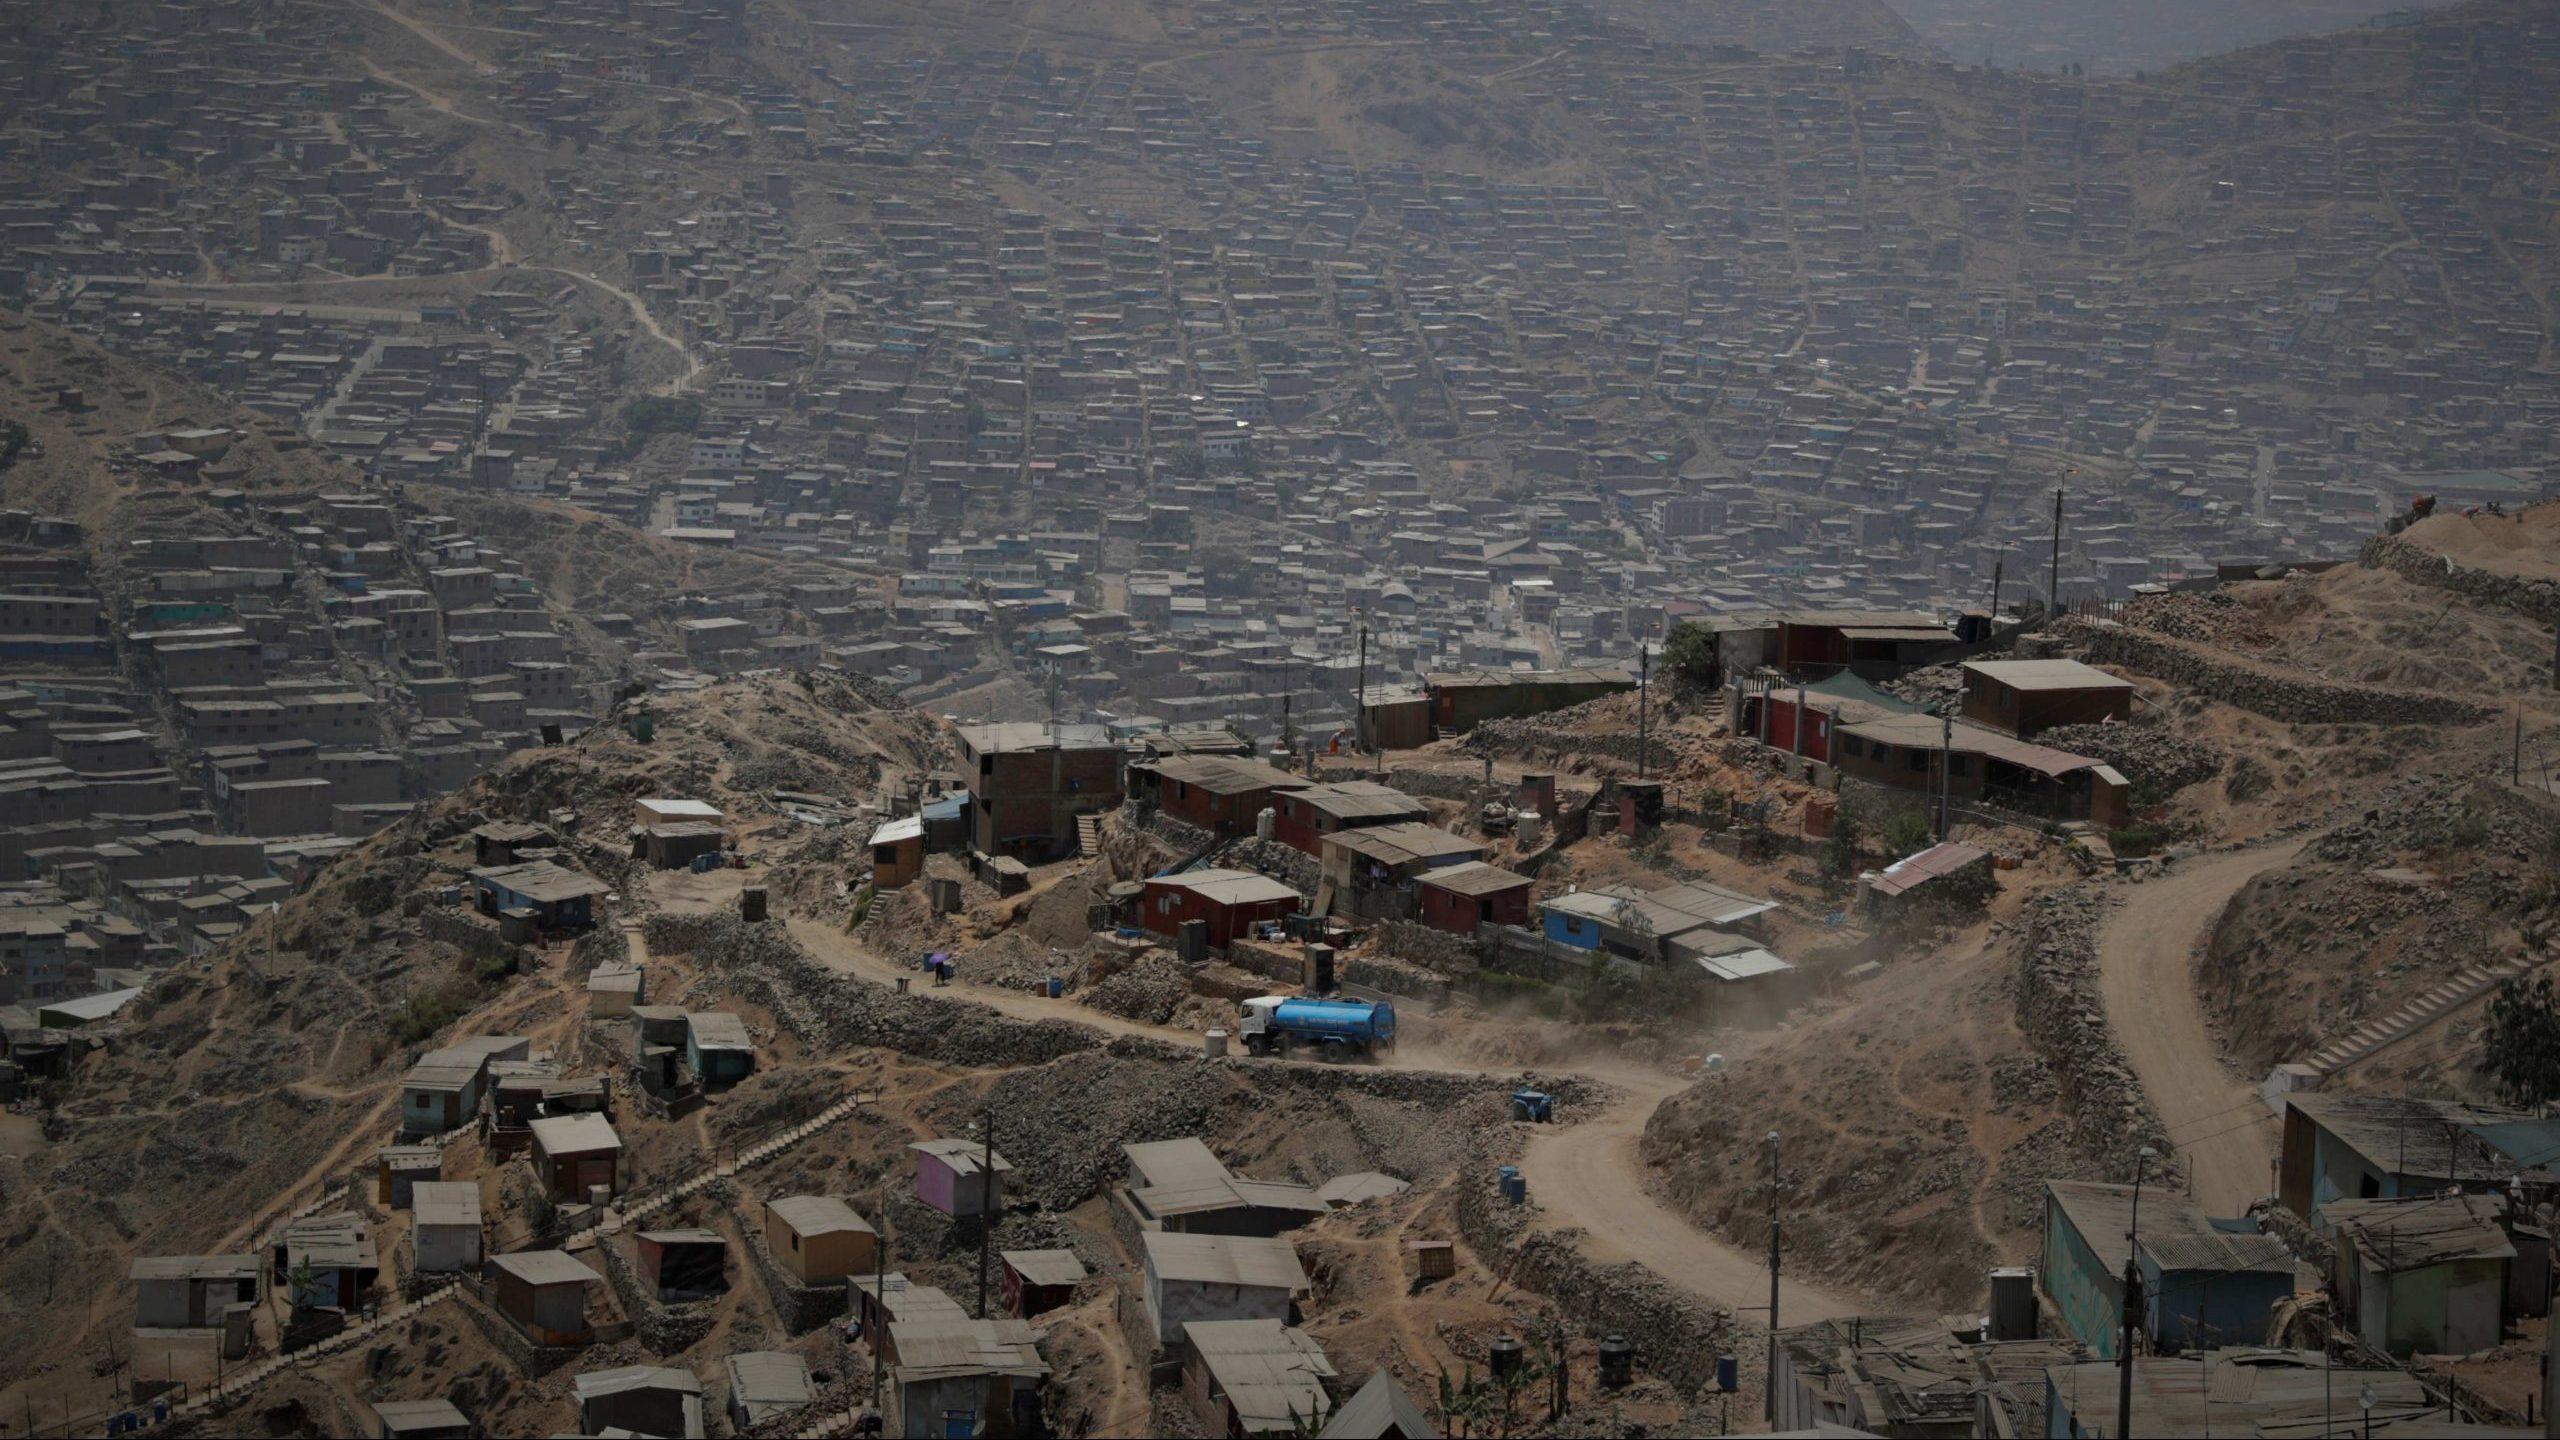 U Peruu autobus se survao niz liticu, poginulo 27 rudara 1